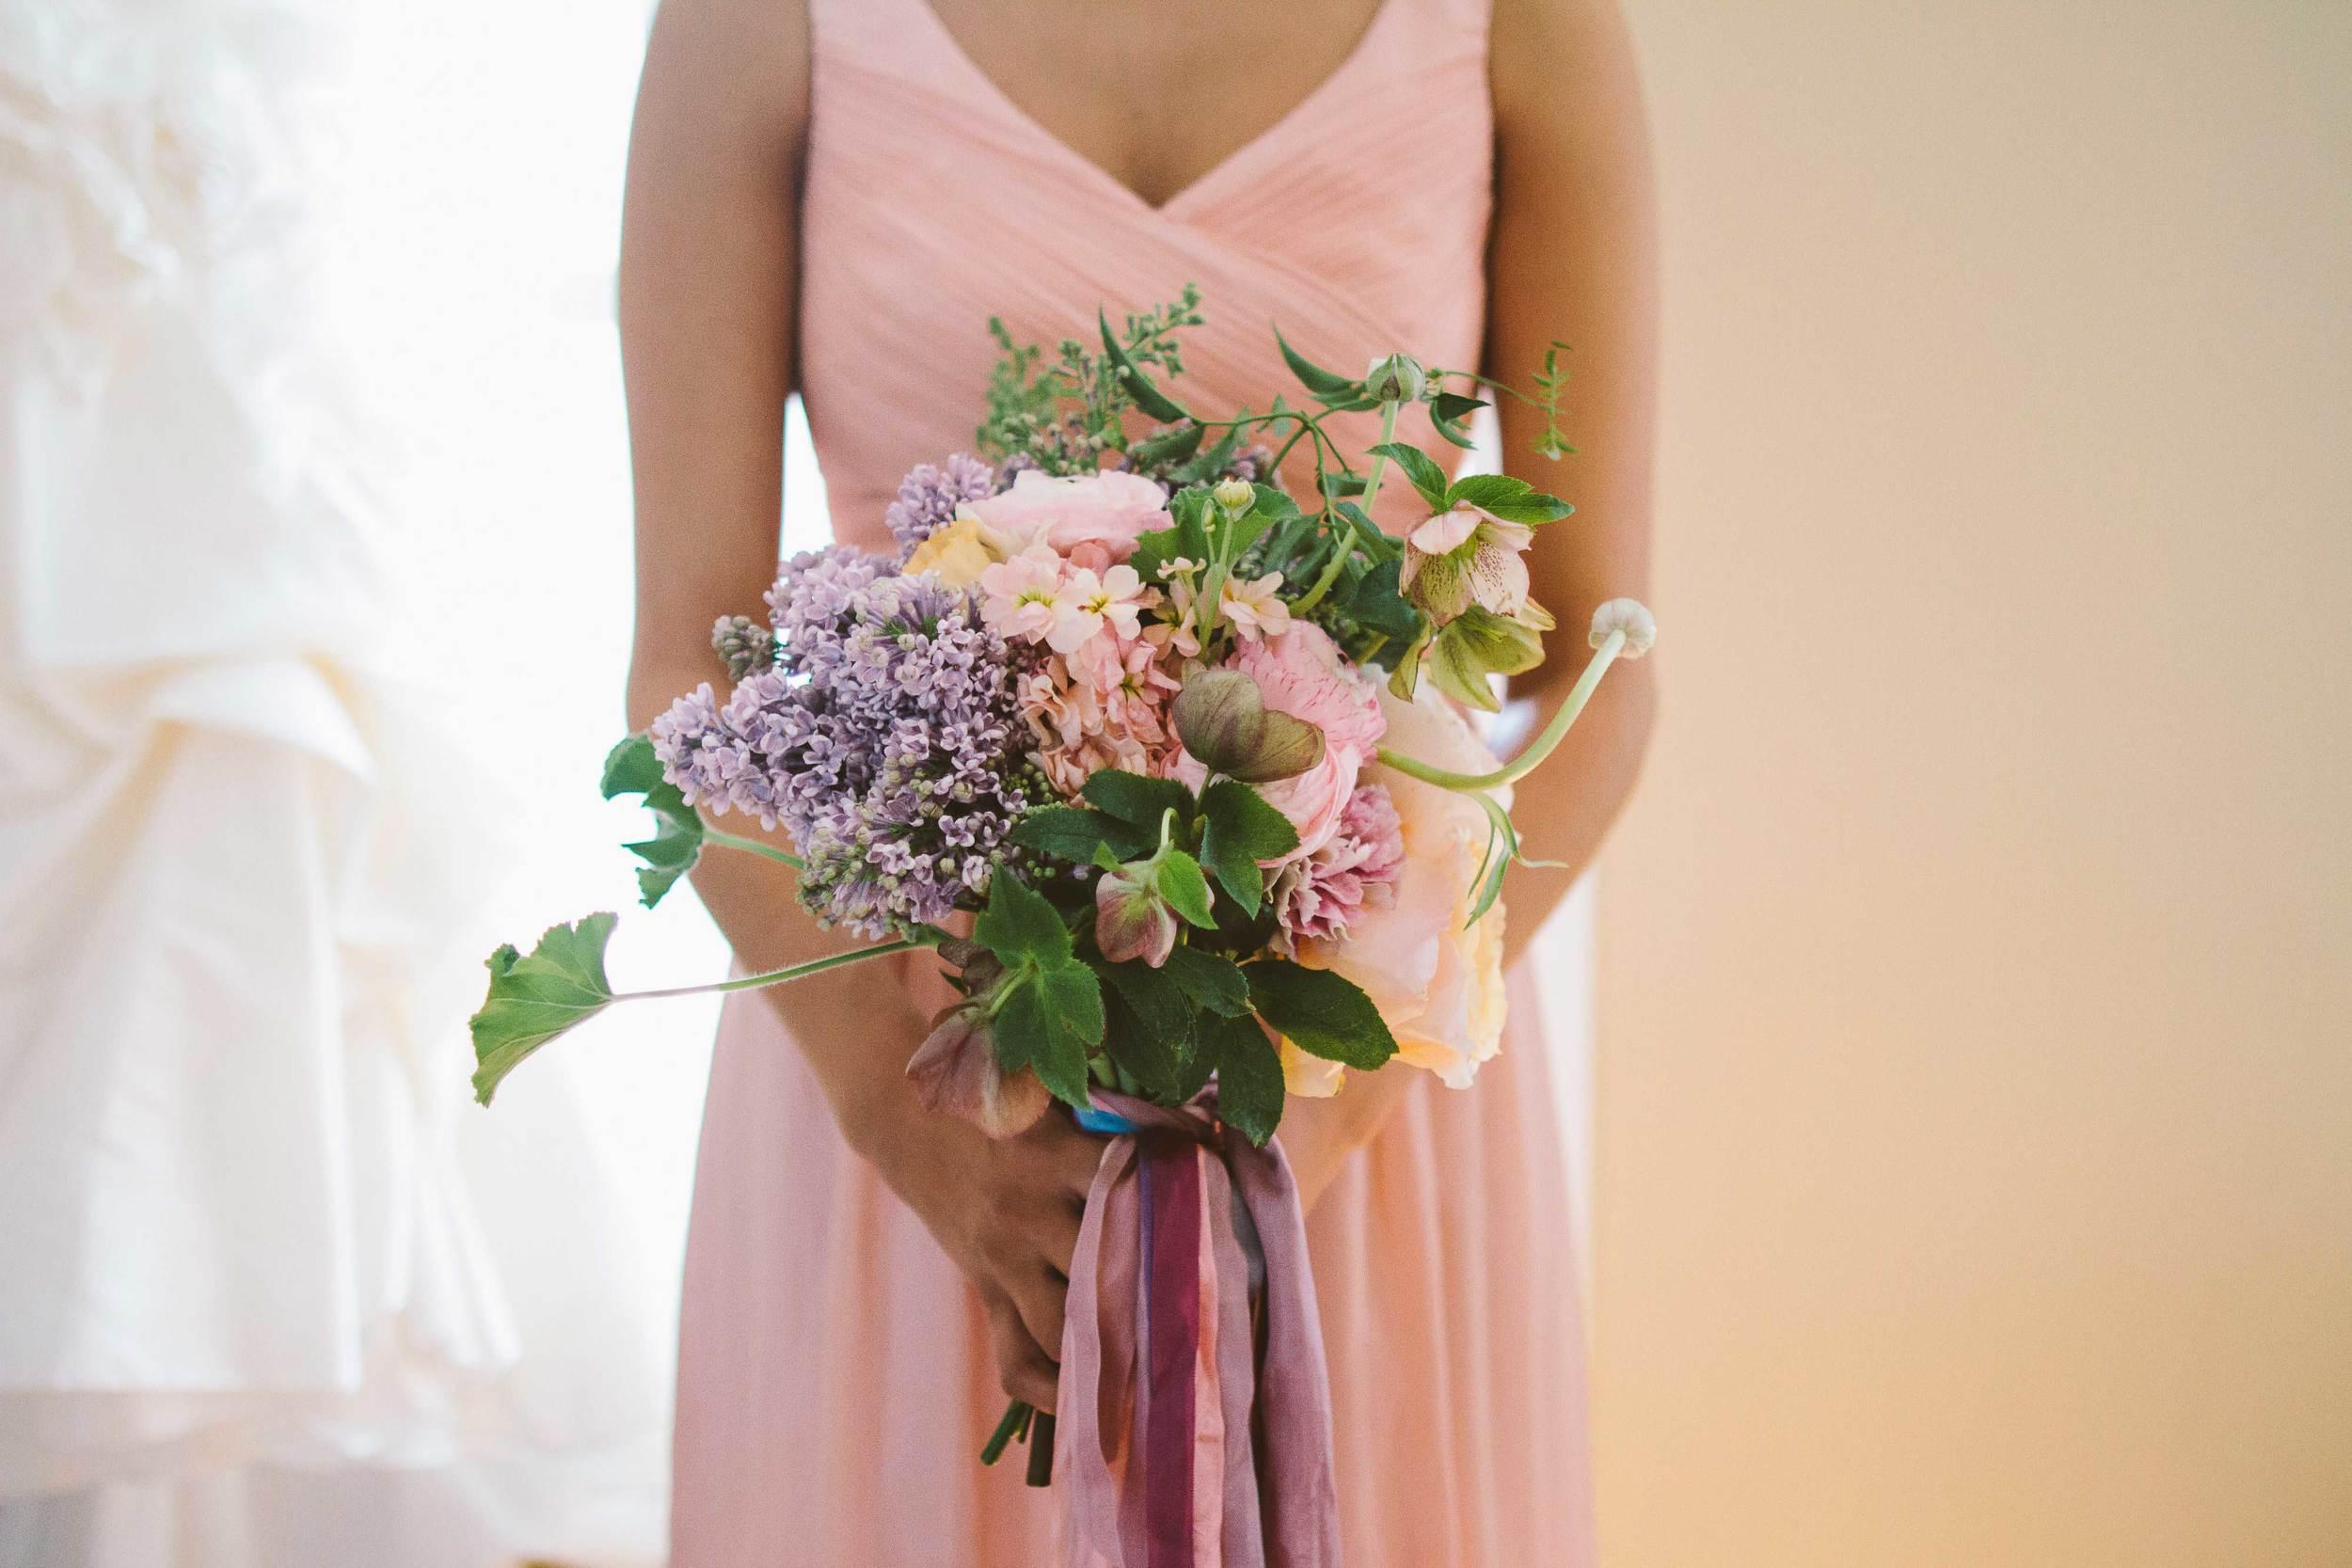 Radka-Wedding-Radka-April-18-2015-0070.jpg